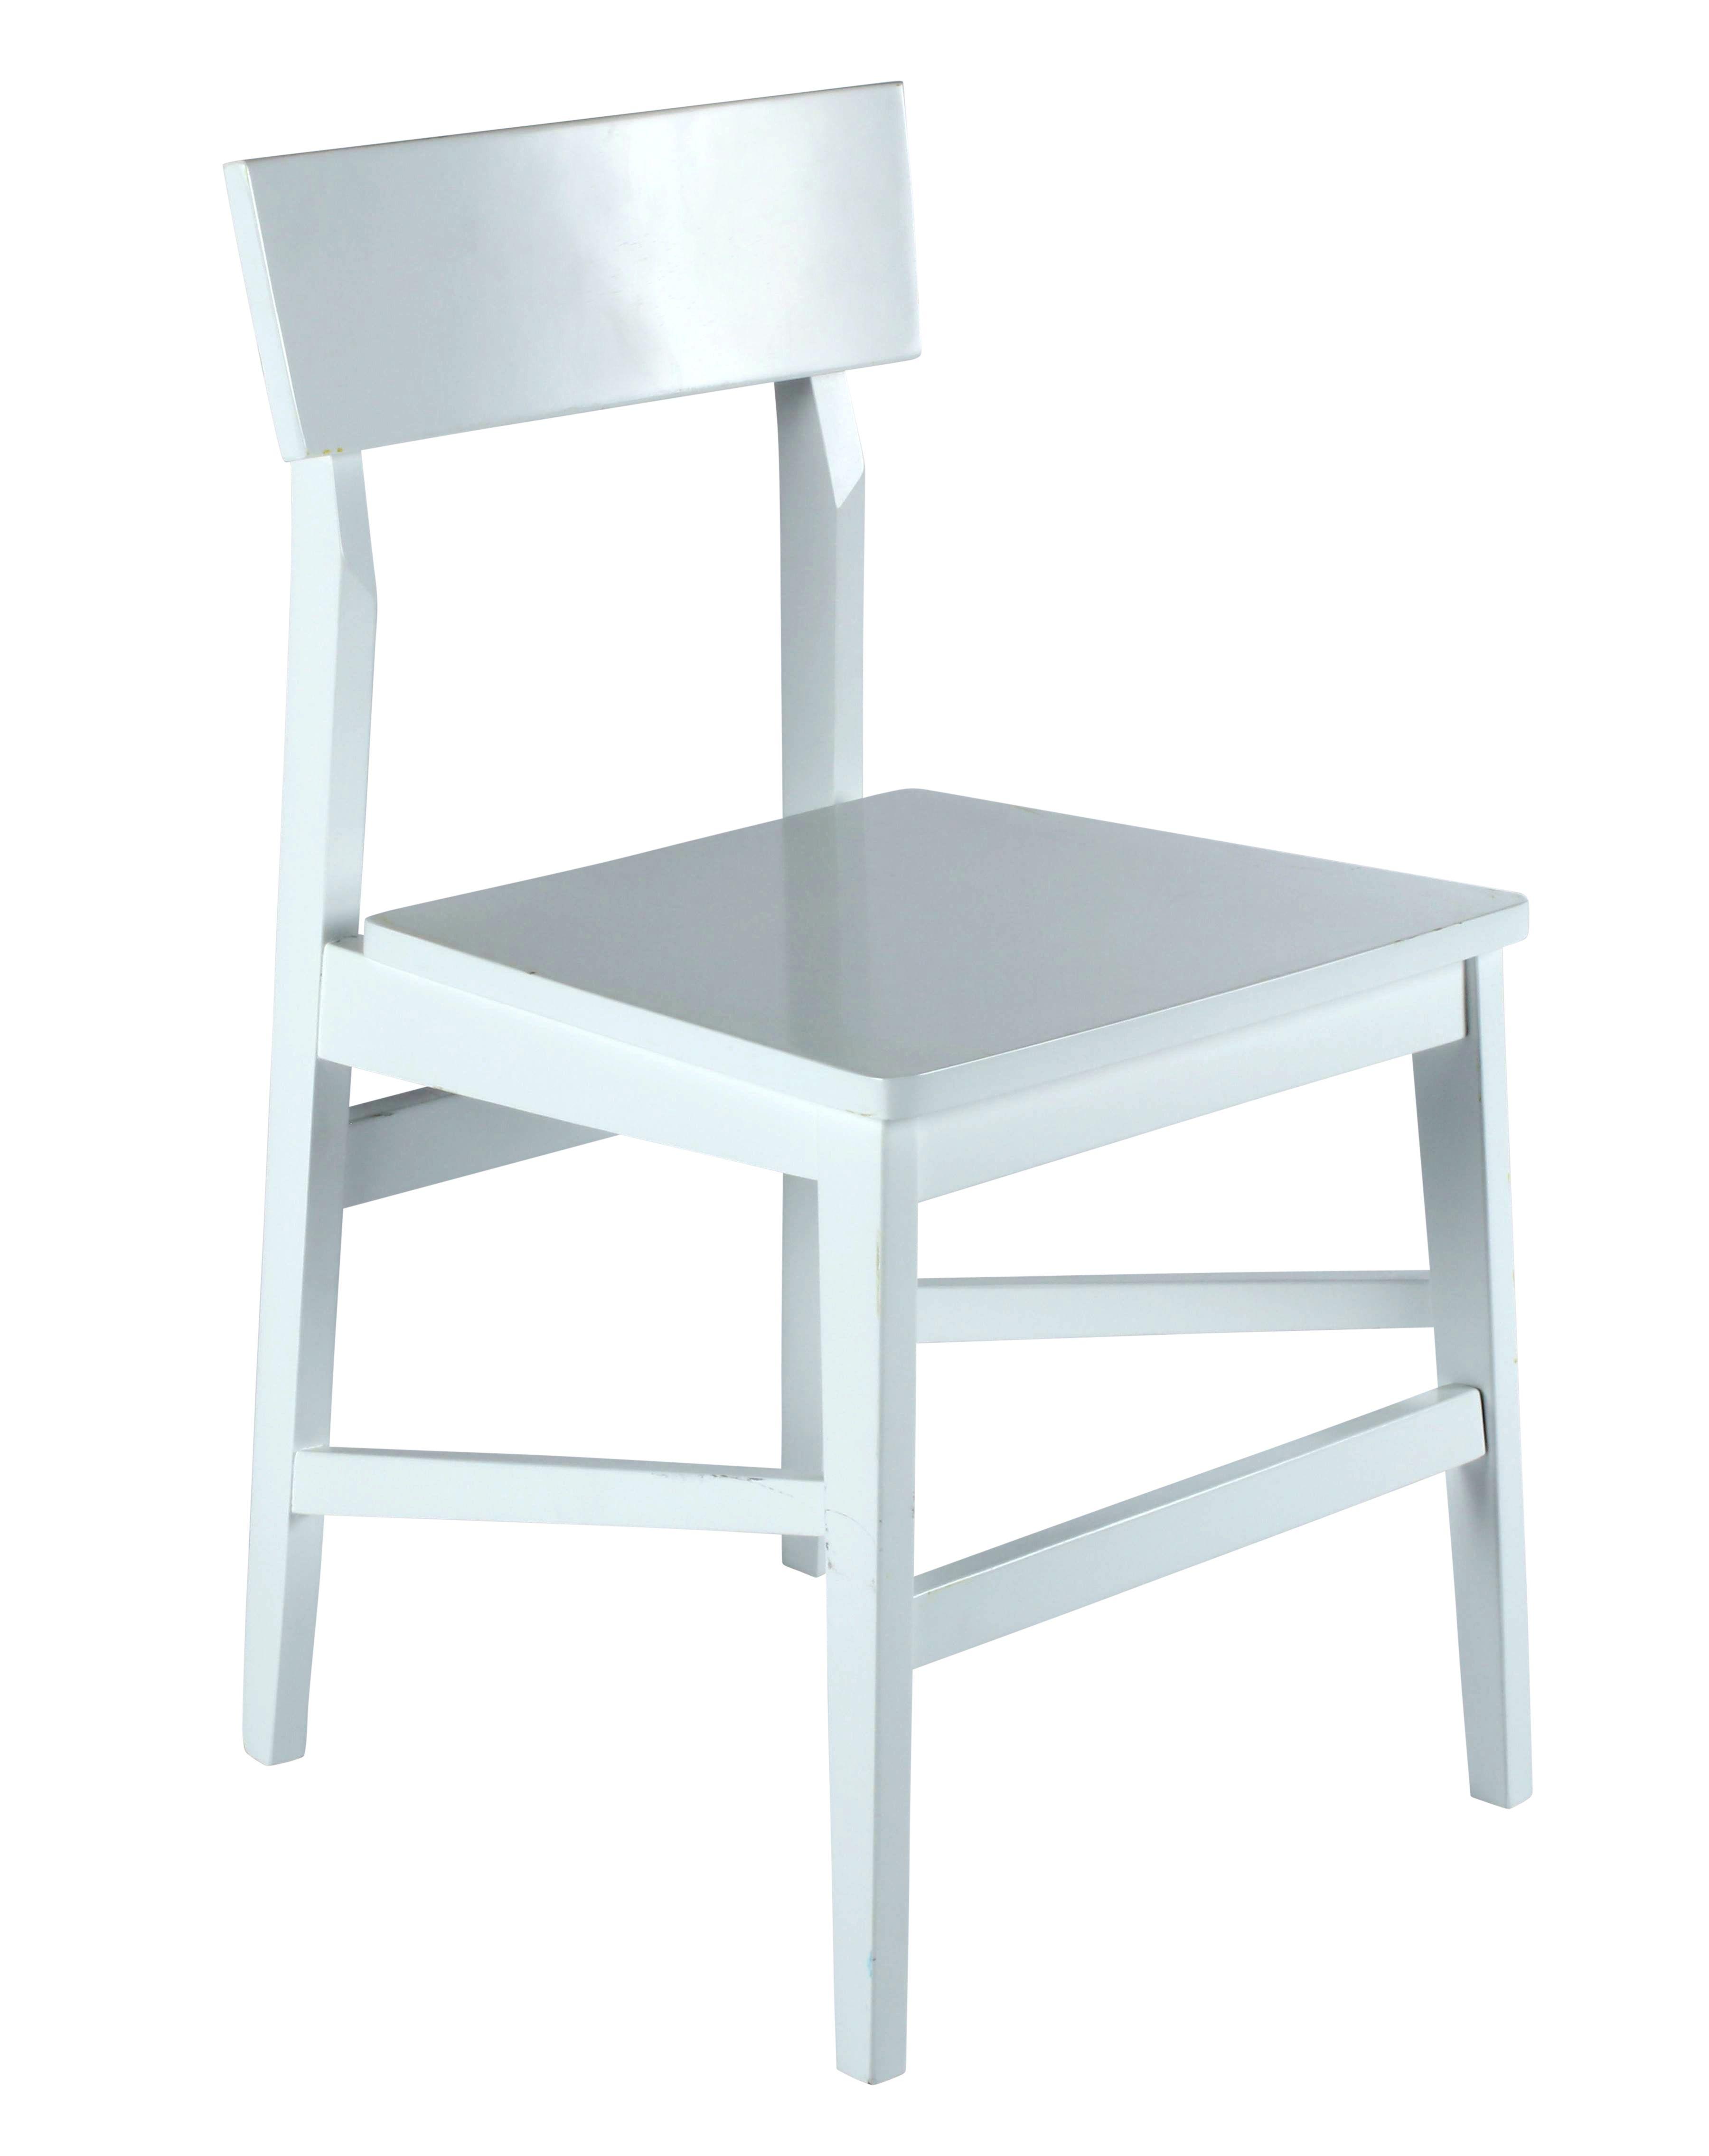 Chaise NADEGE Blanc Meuble canapé, Chaise et Achat meuble